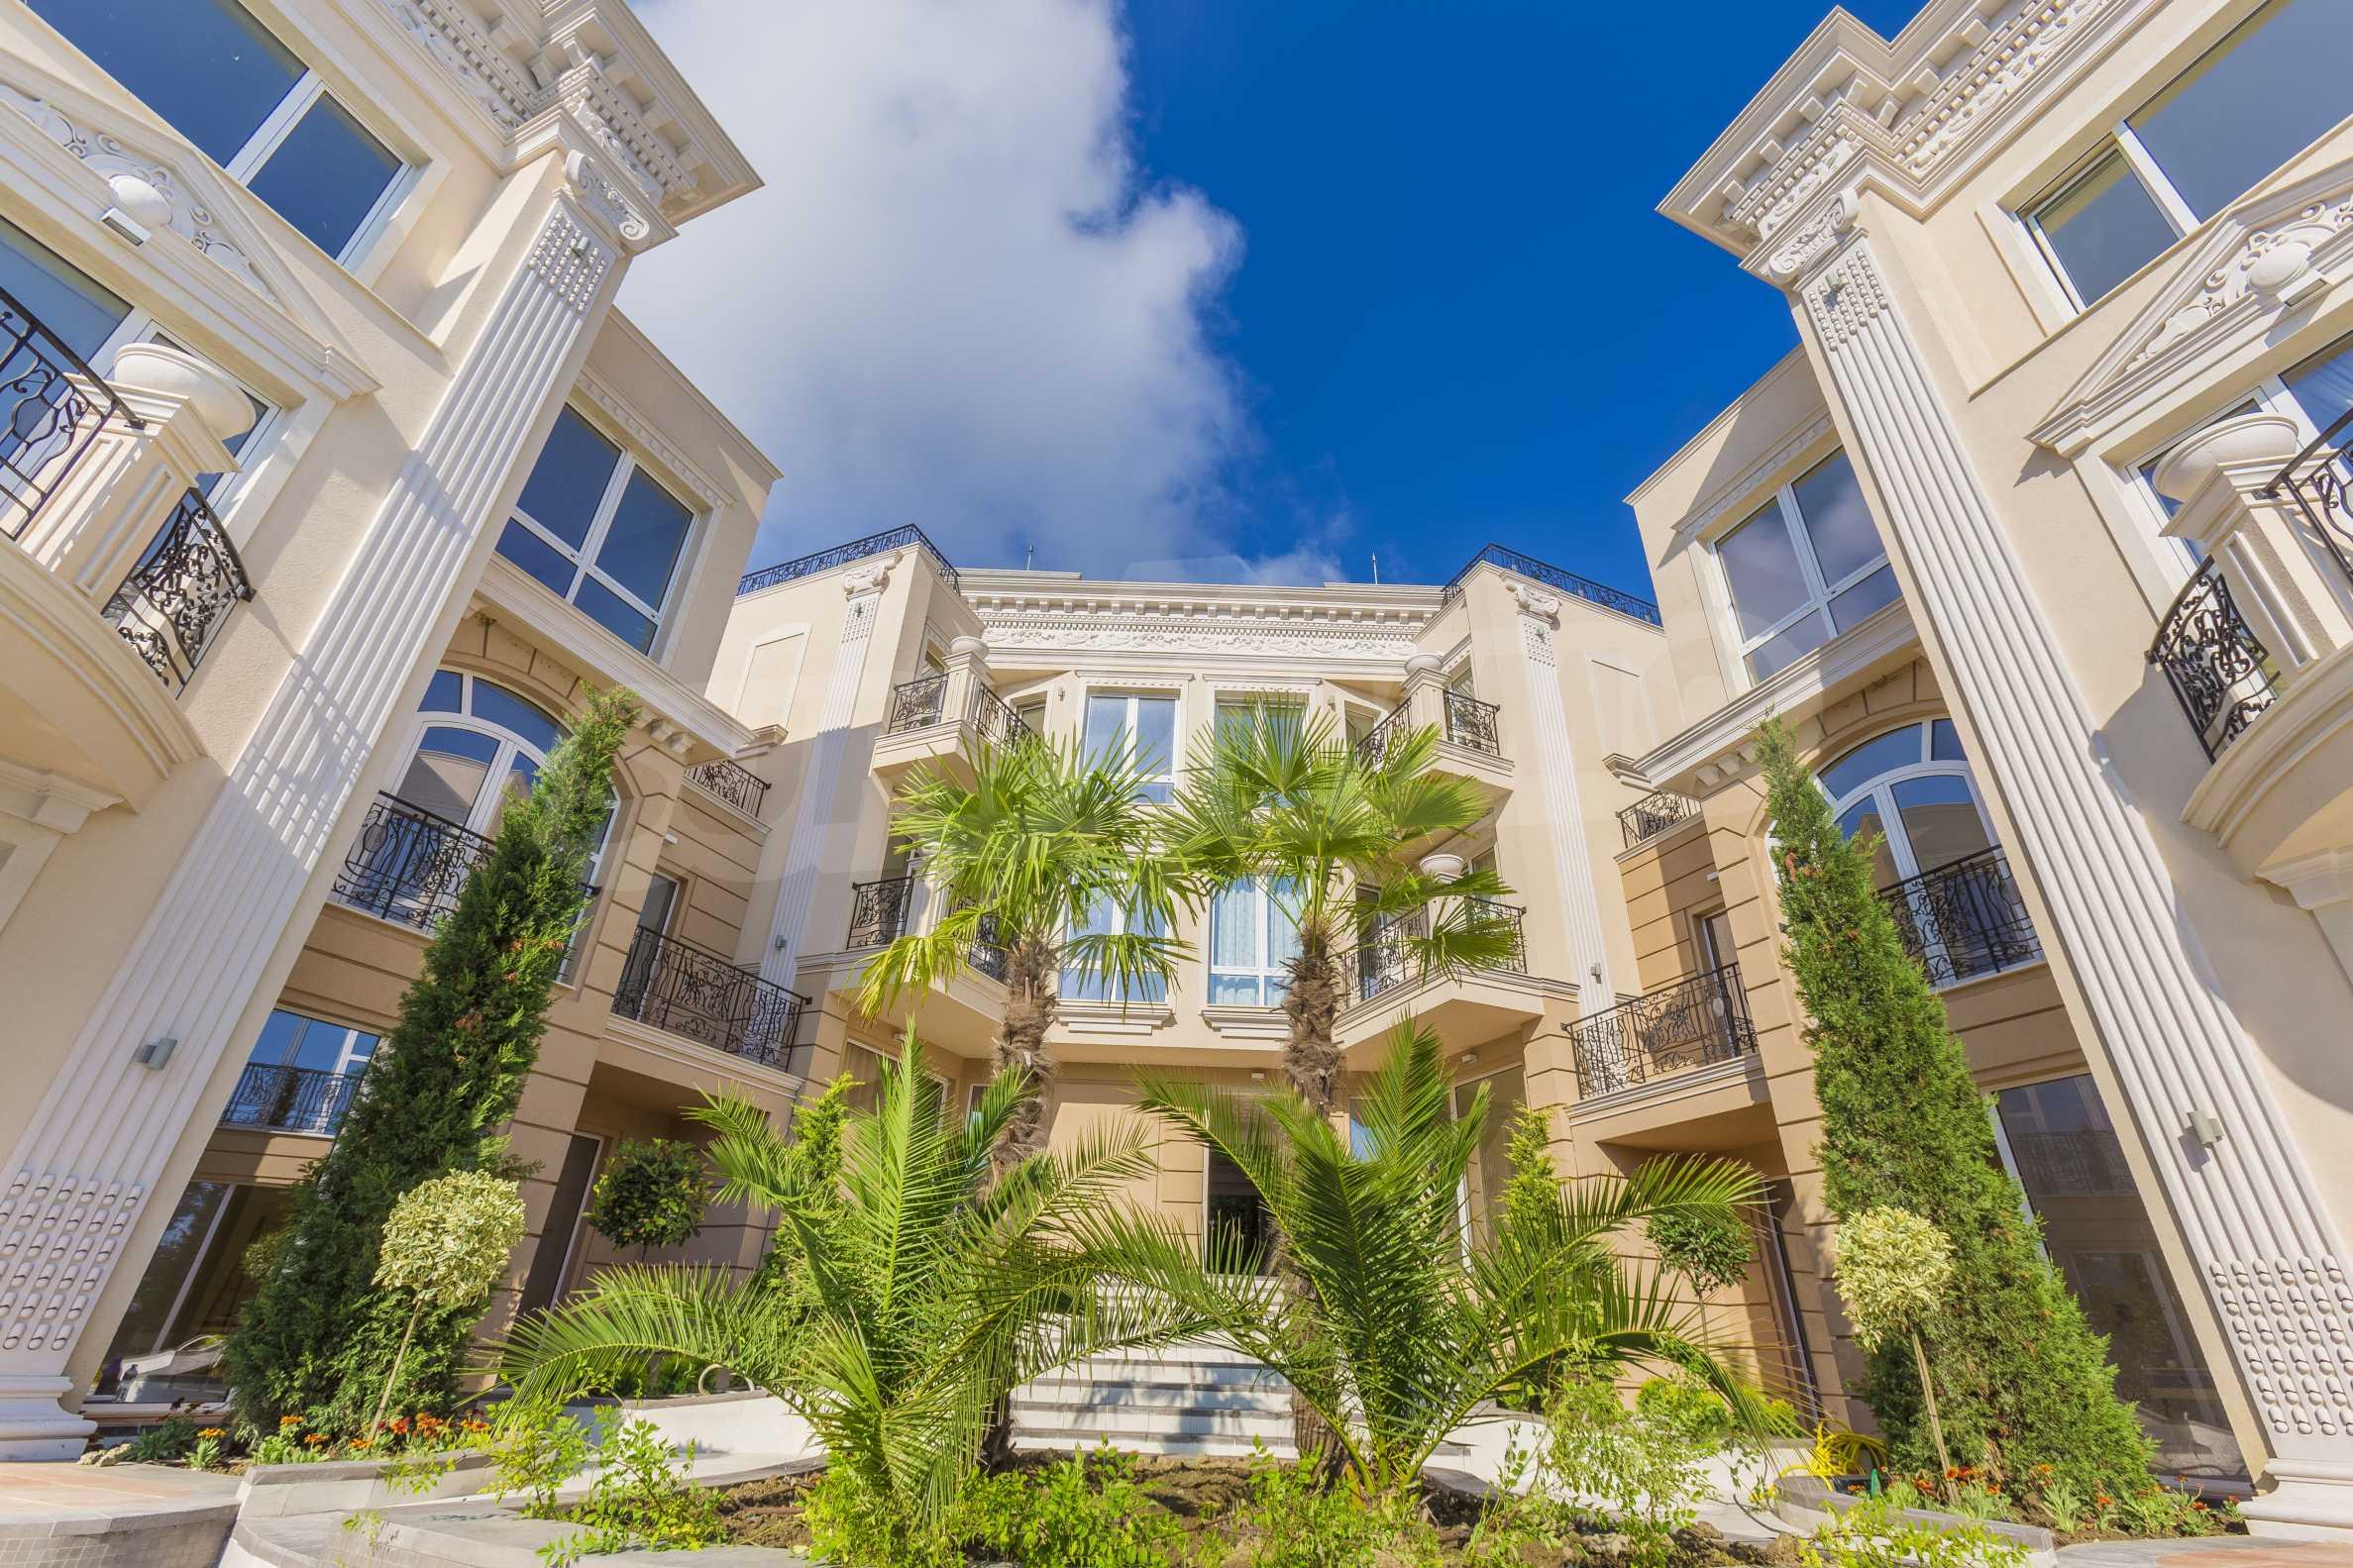 Комфортен двустаен апартамент под наем в Belle Époque Beach Residence, курорт Лозенец 32